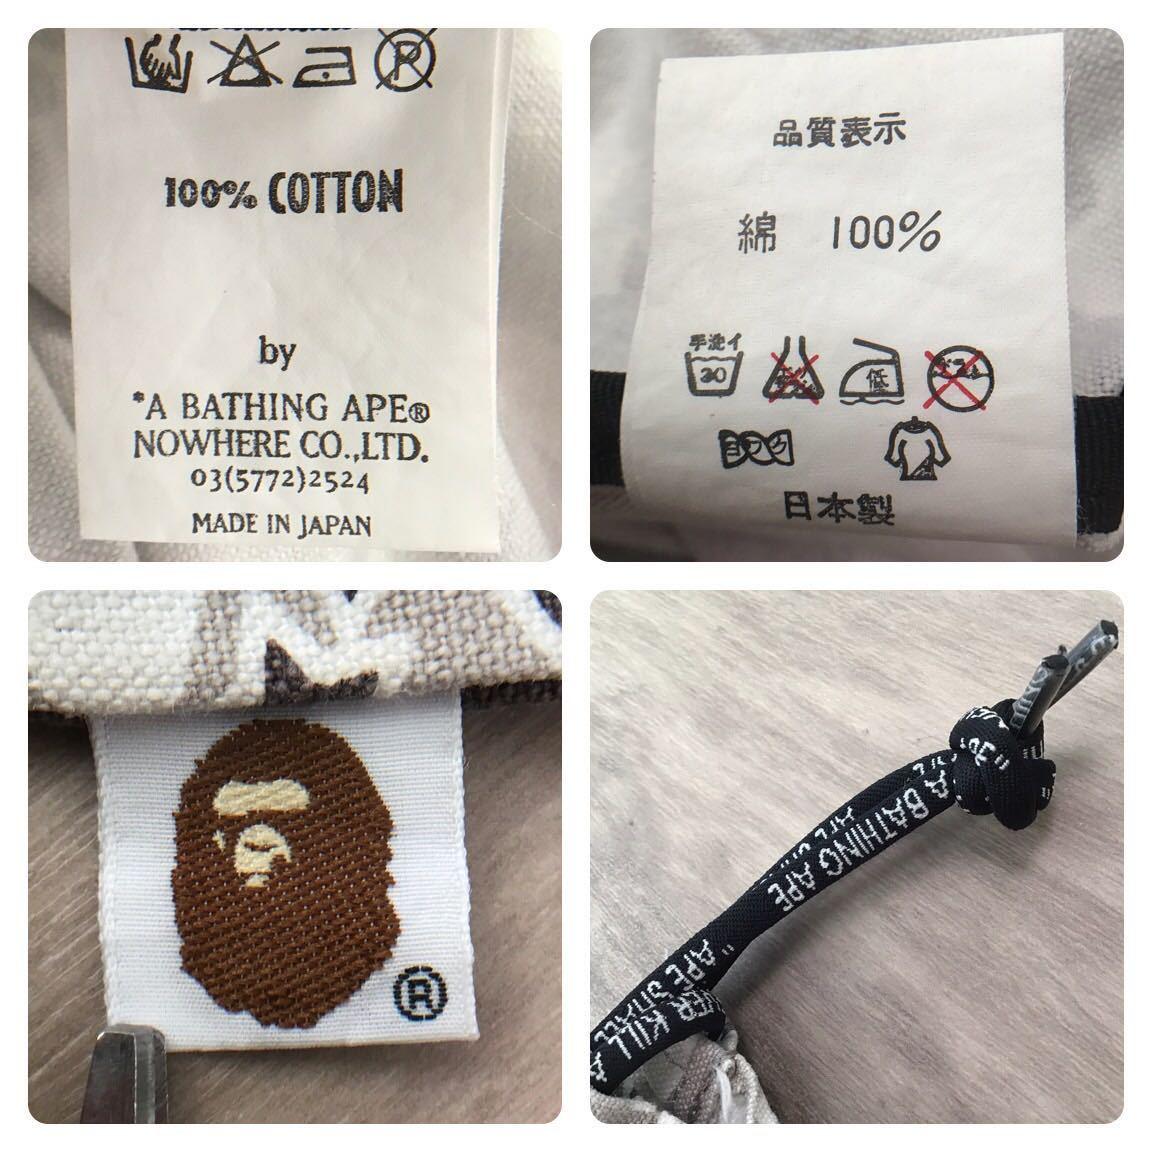 sta camo 巾着袋 a bathing ape bape foot soldier バッグ bag エイプ ベイプ フットソルジャー psyche camo 迷彩 nigo 7541